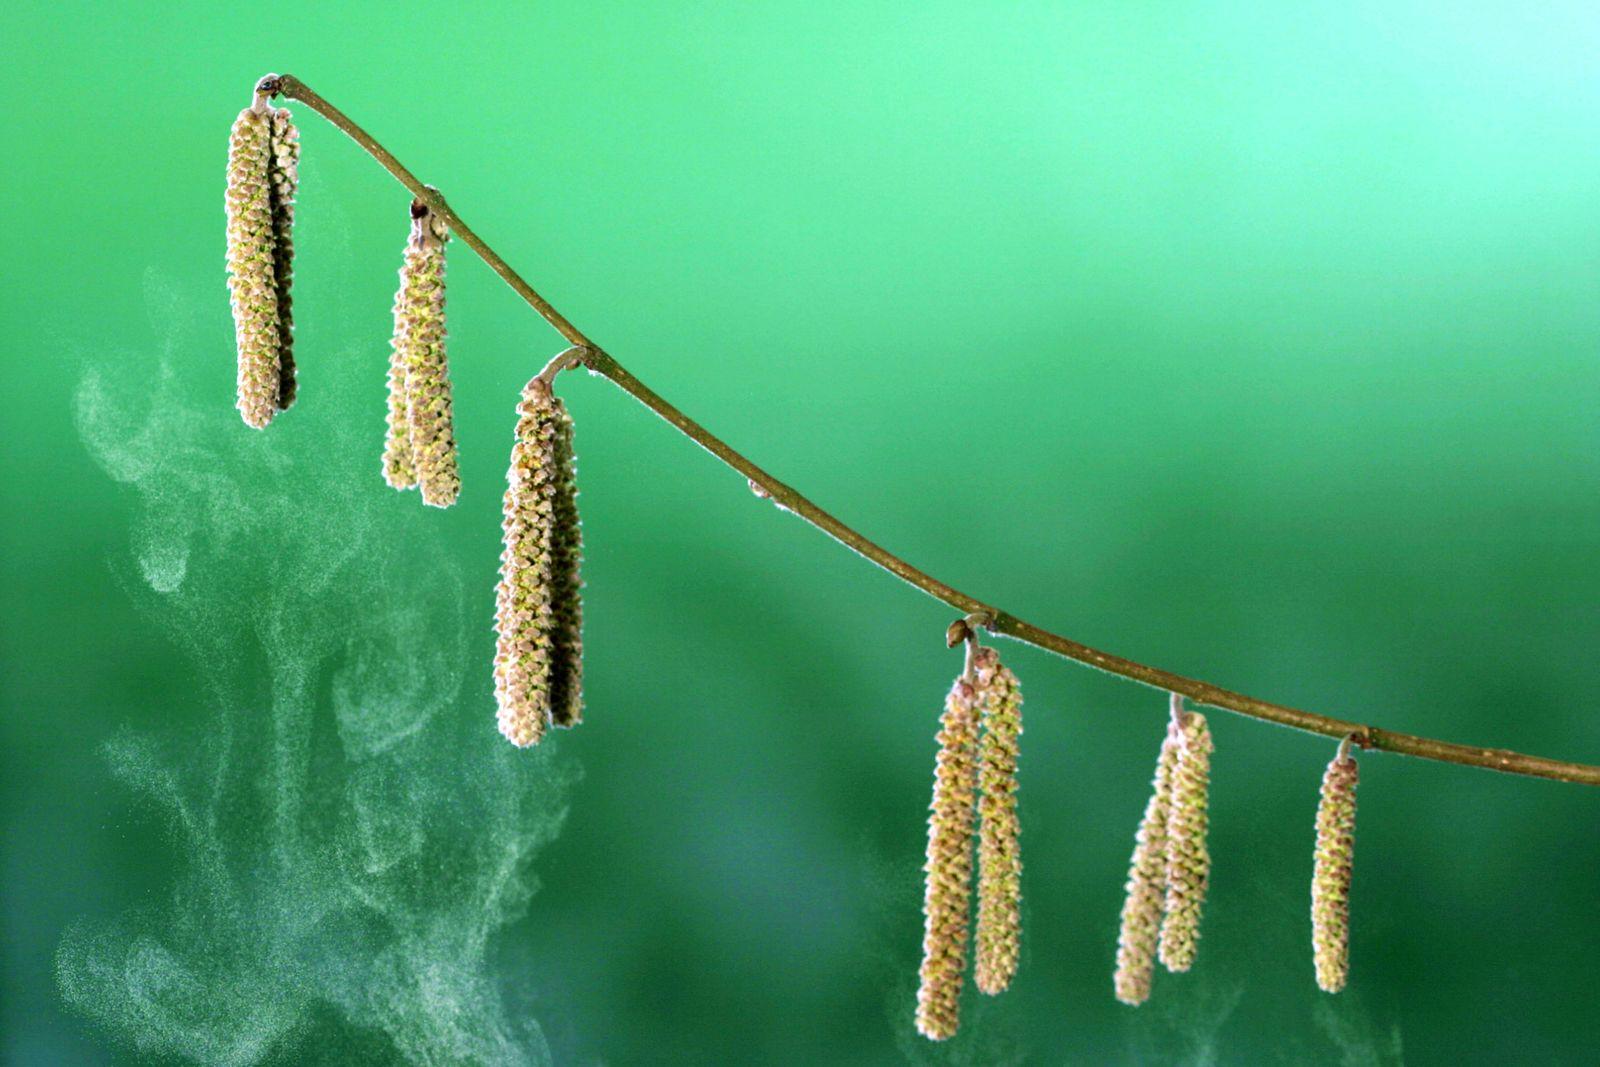 Gewoehnliche Haselnuss, Hasel, Haselstrauch, Corylus avellana, common hazel